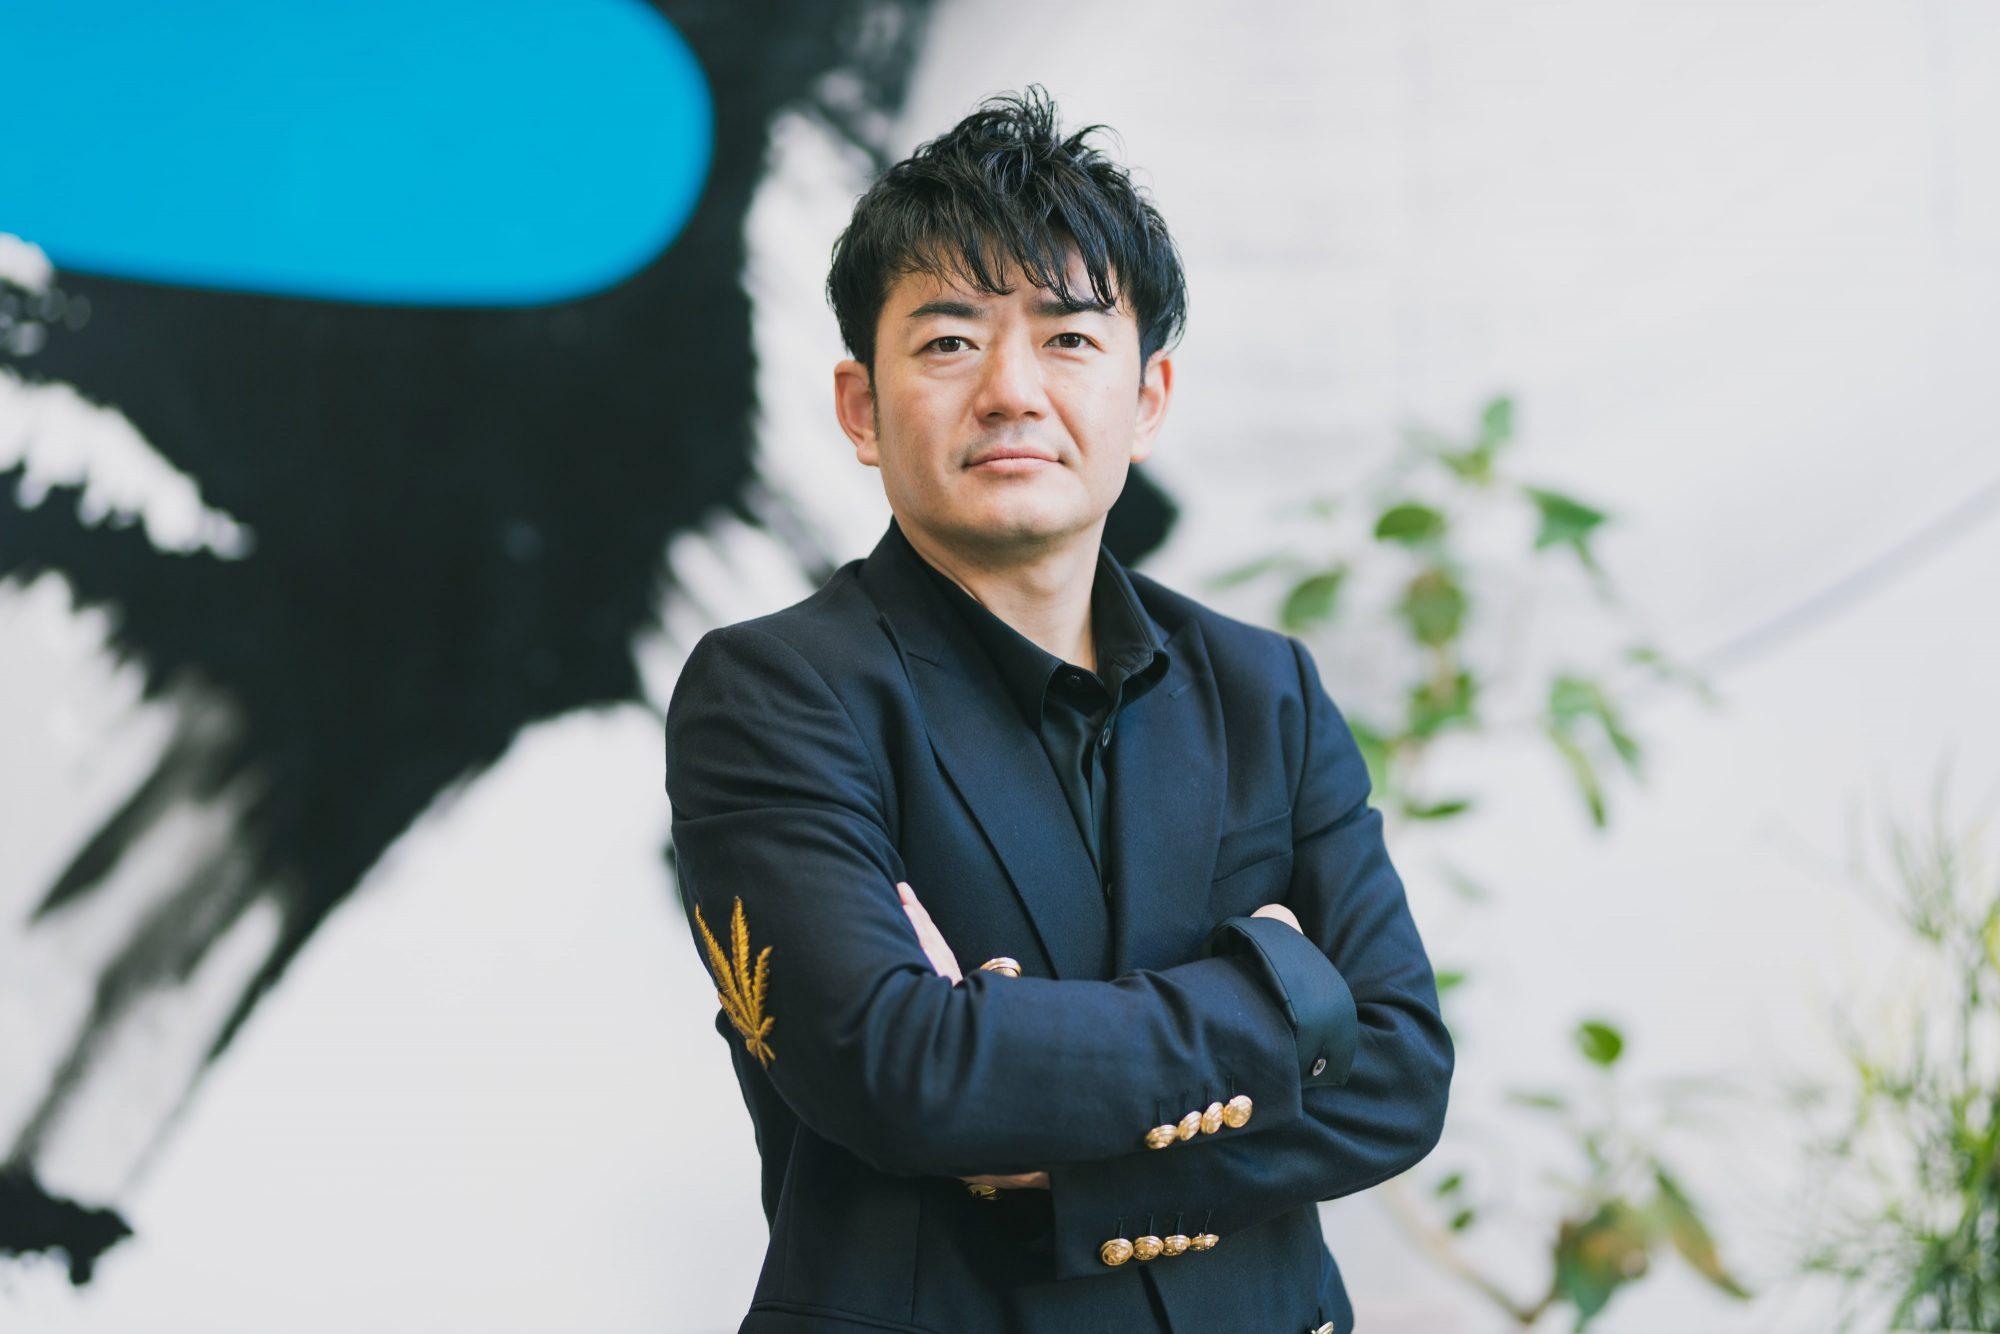 takimoto-hiroko